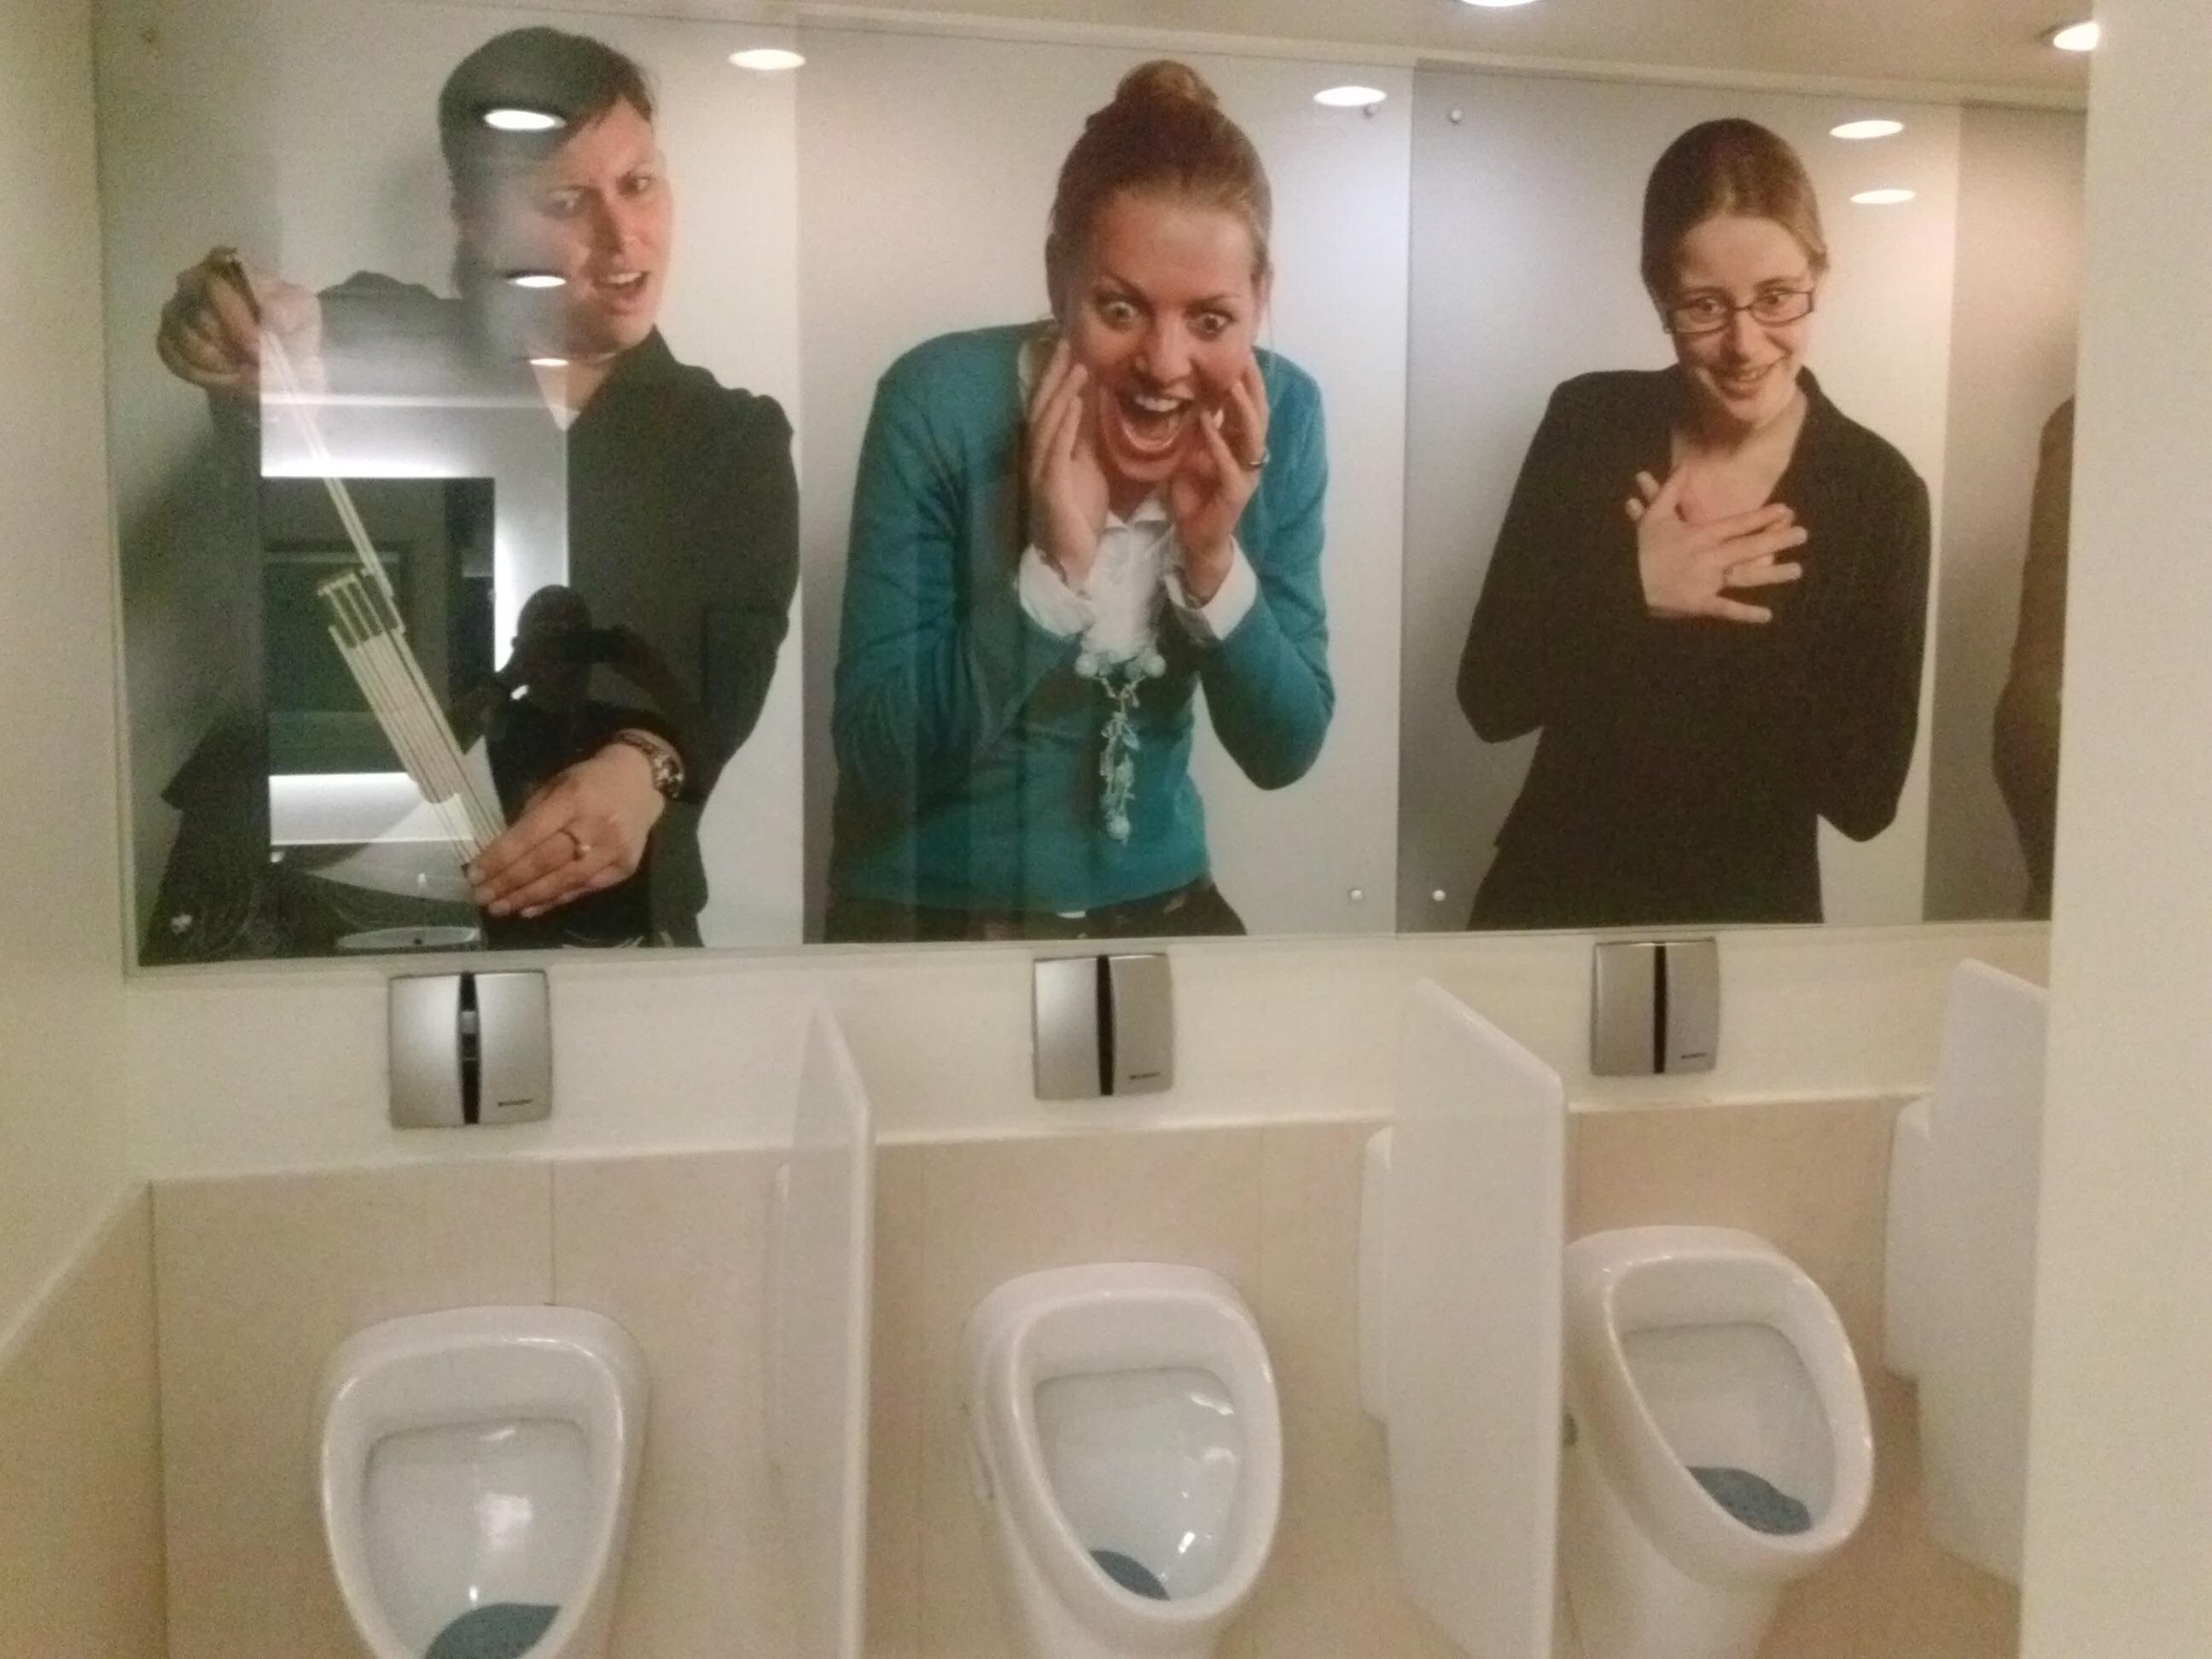 These ladies were in the men's room in Belgium!